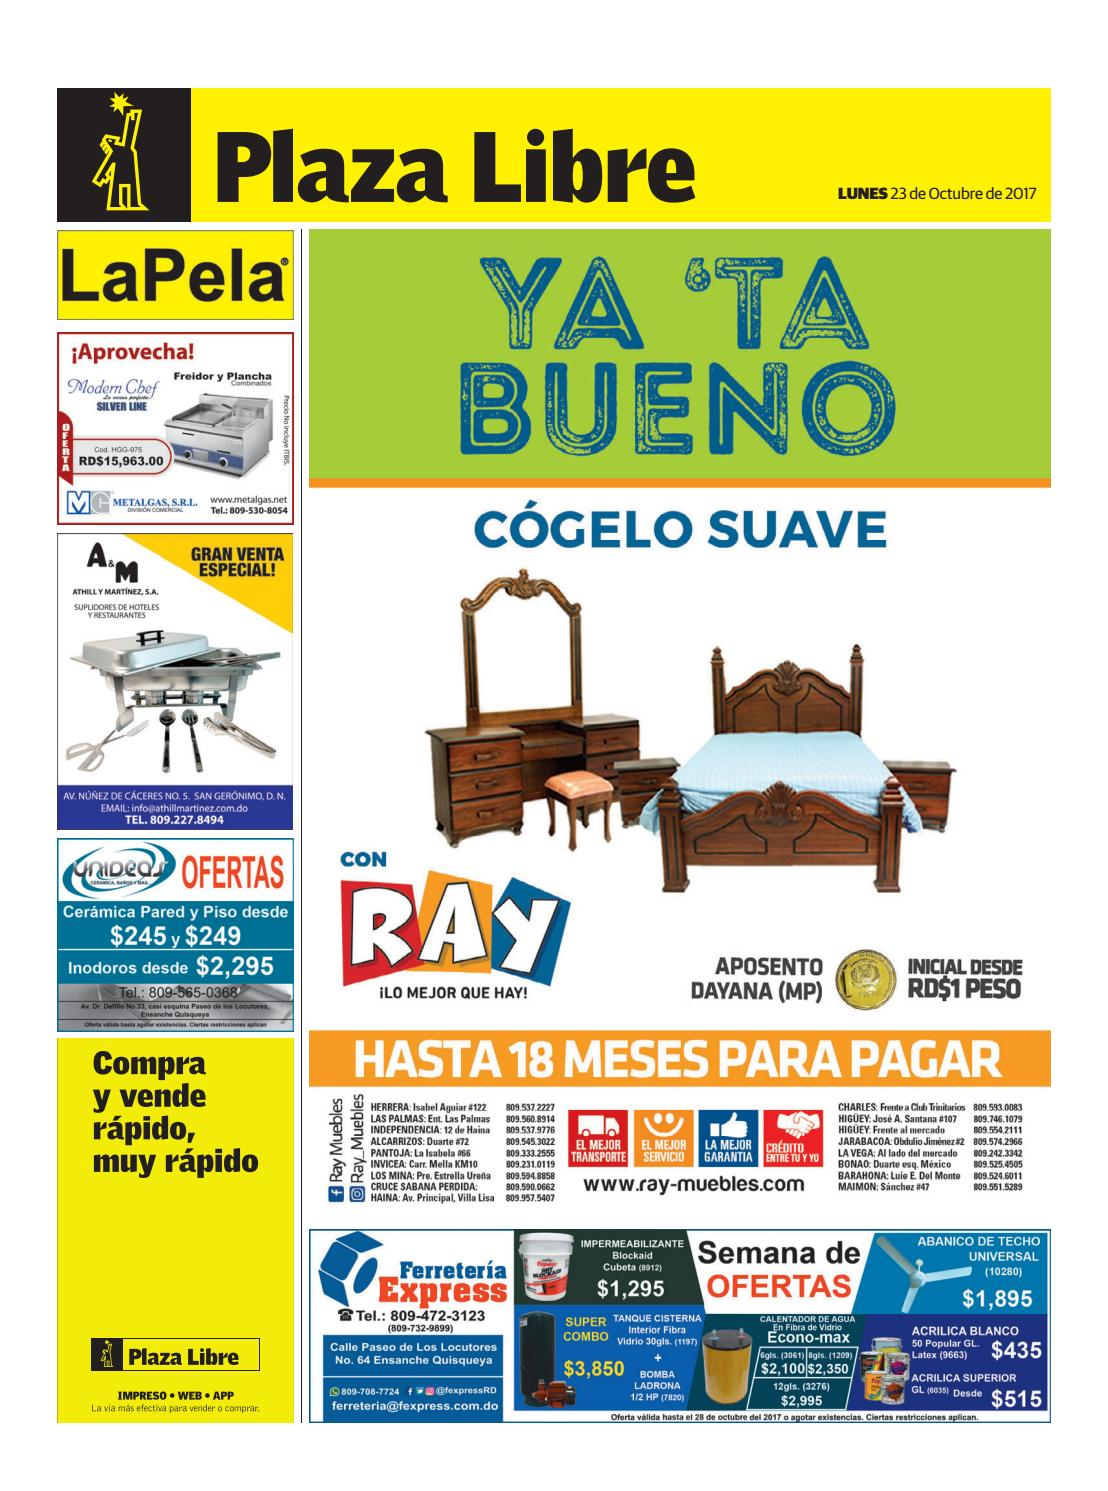 Carte Accord D Economax.Pl20171023 By Diario Libre Issuu